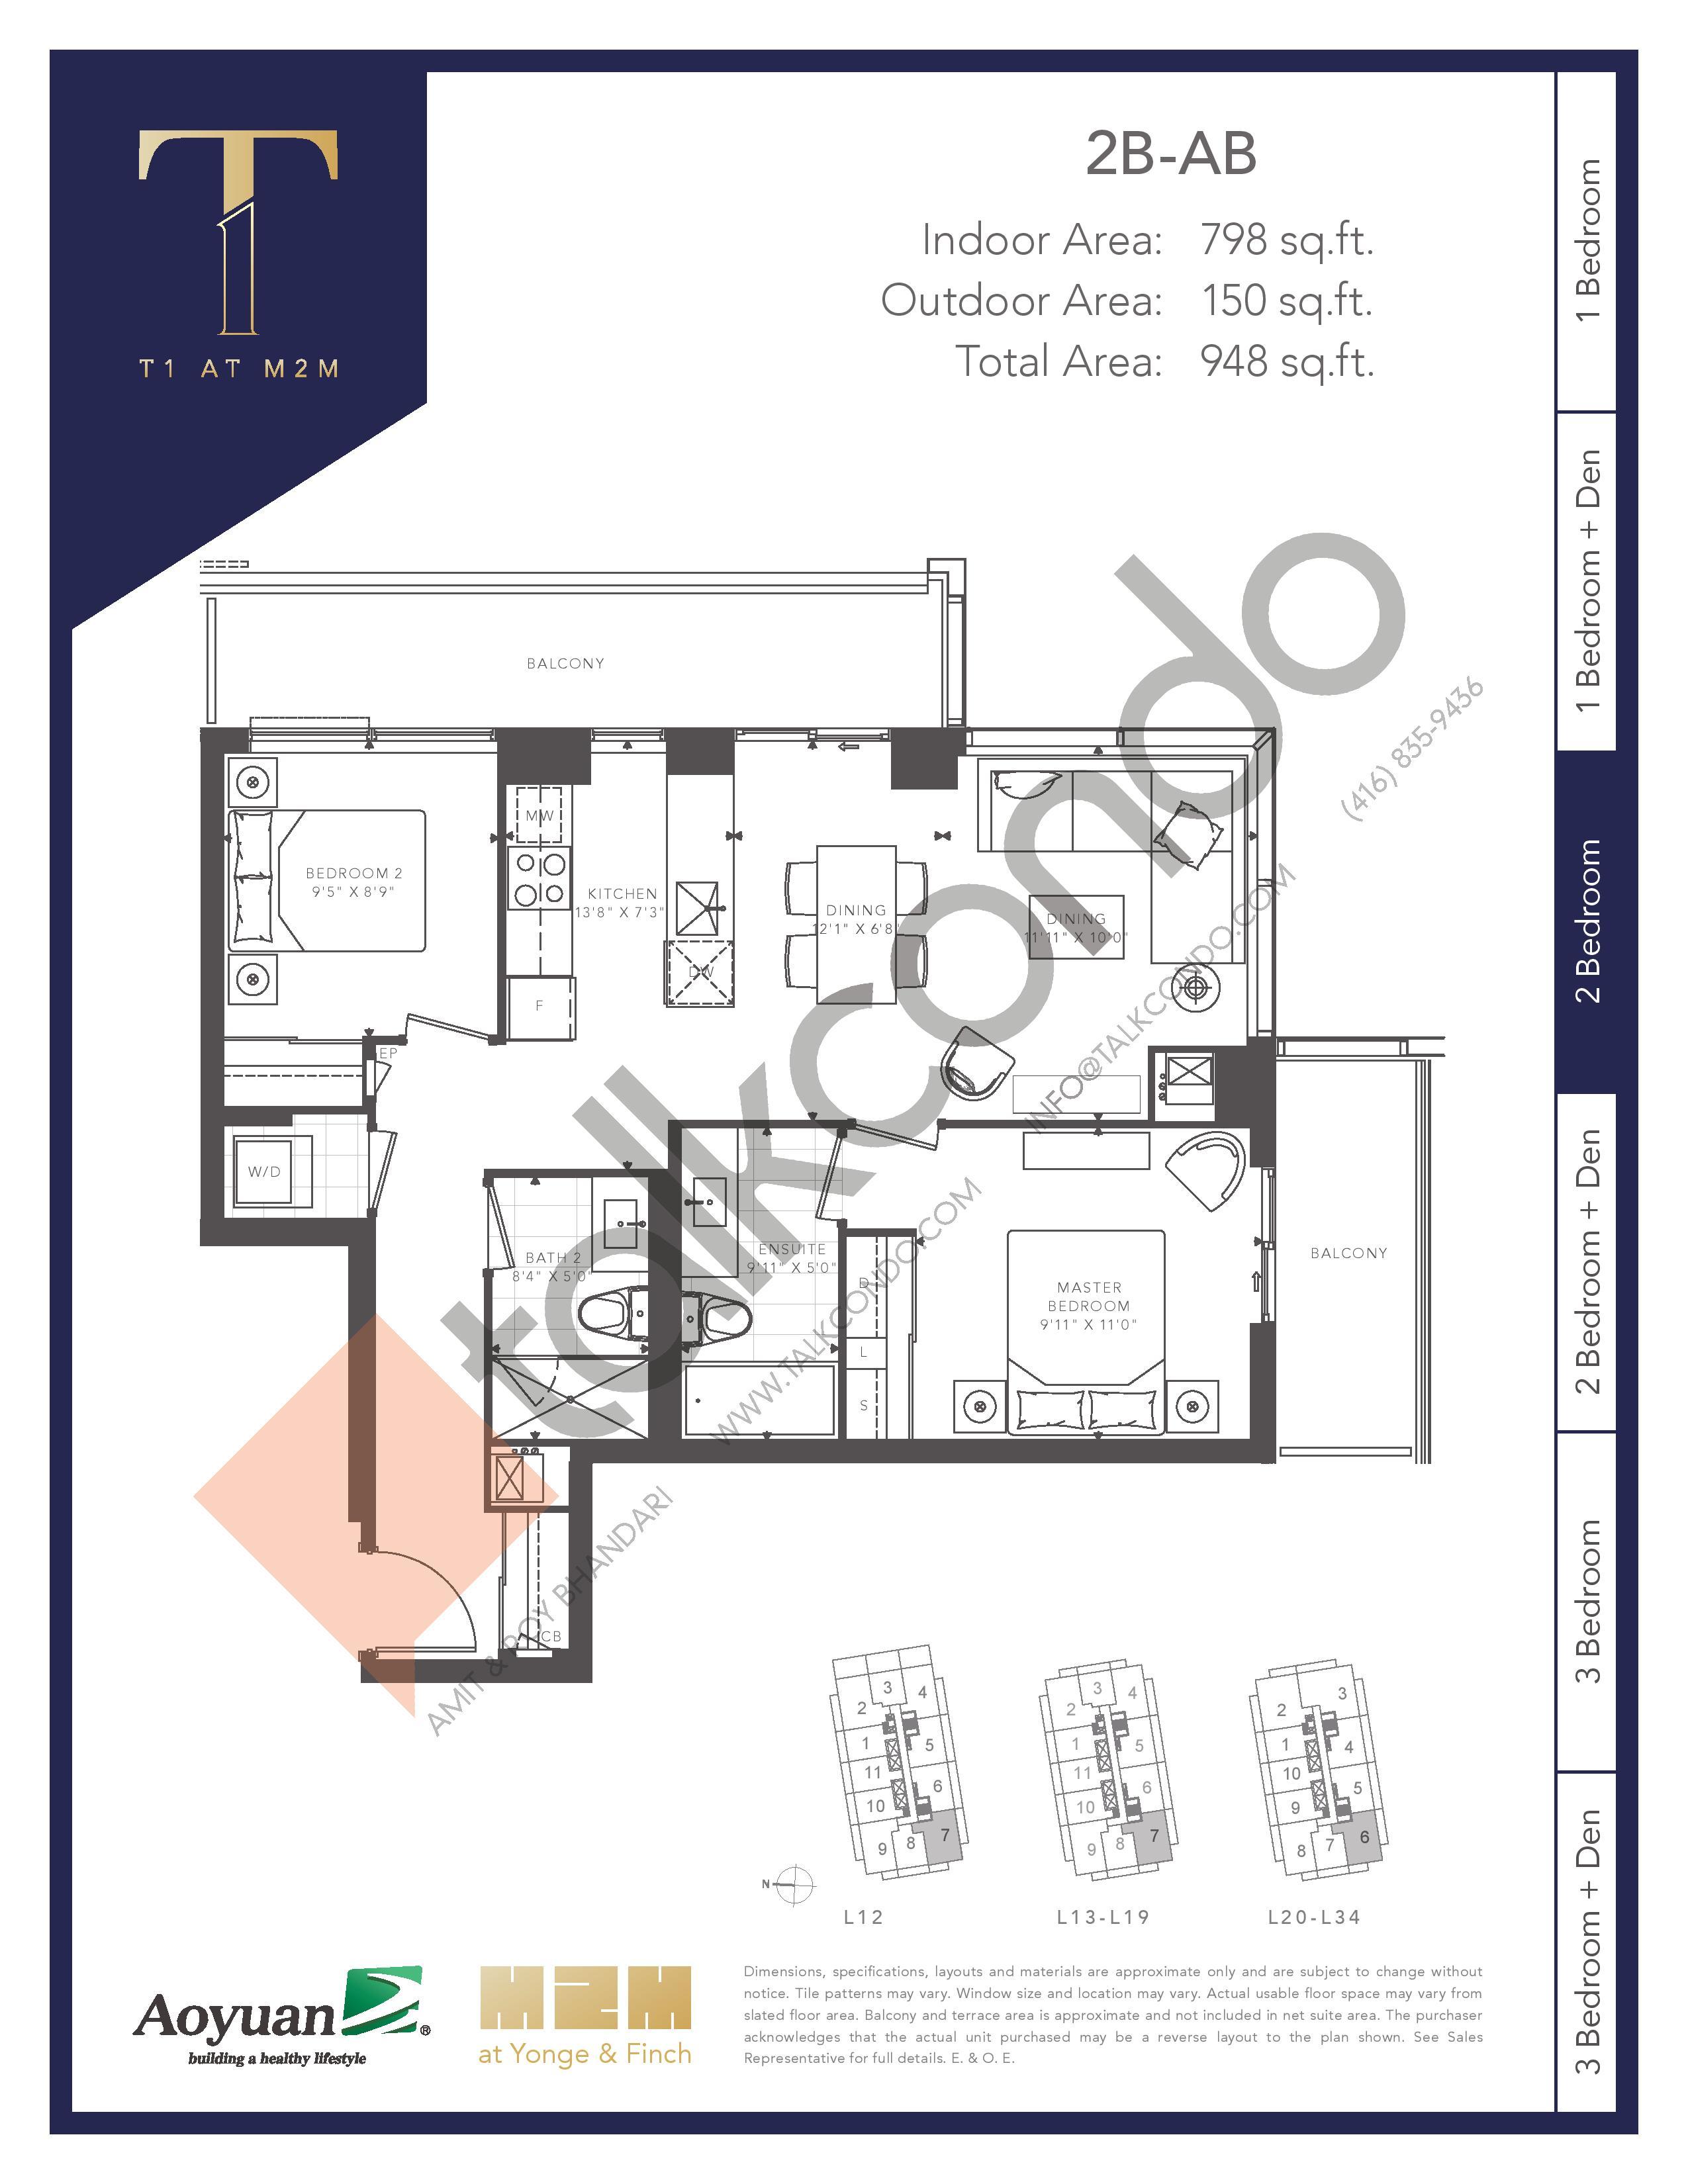 2B-AB (Tower) Floor Plan at T1 at M2M Condos - 798 sq.ft